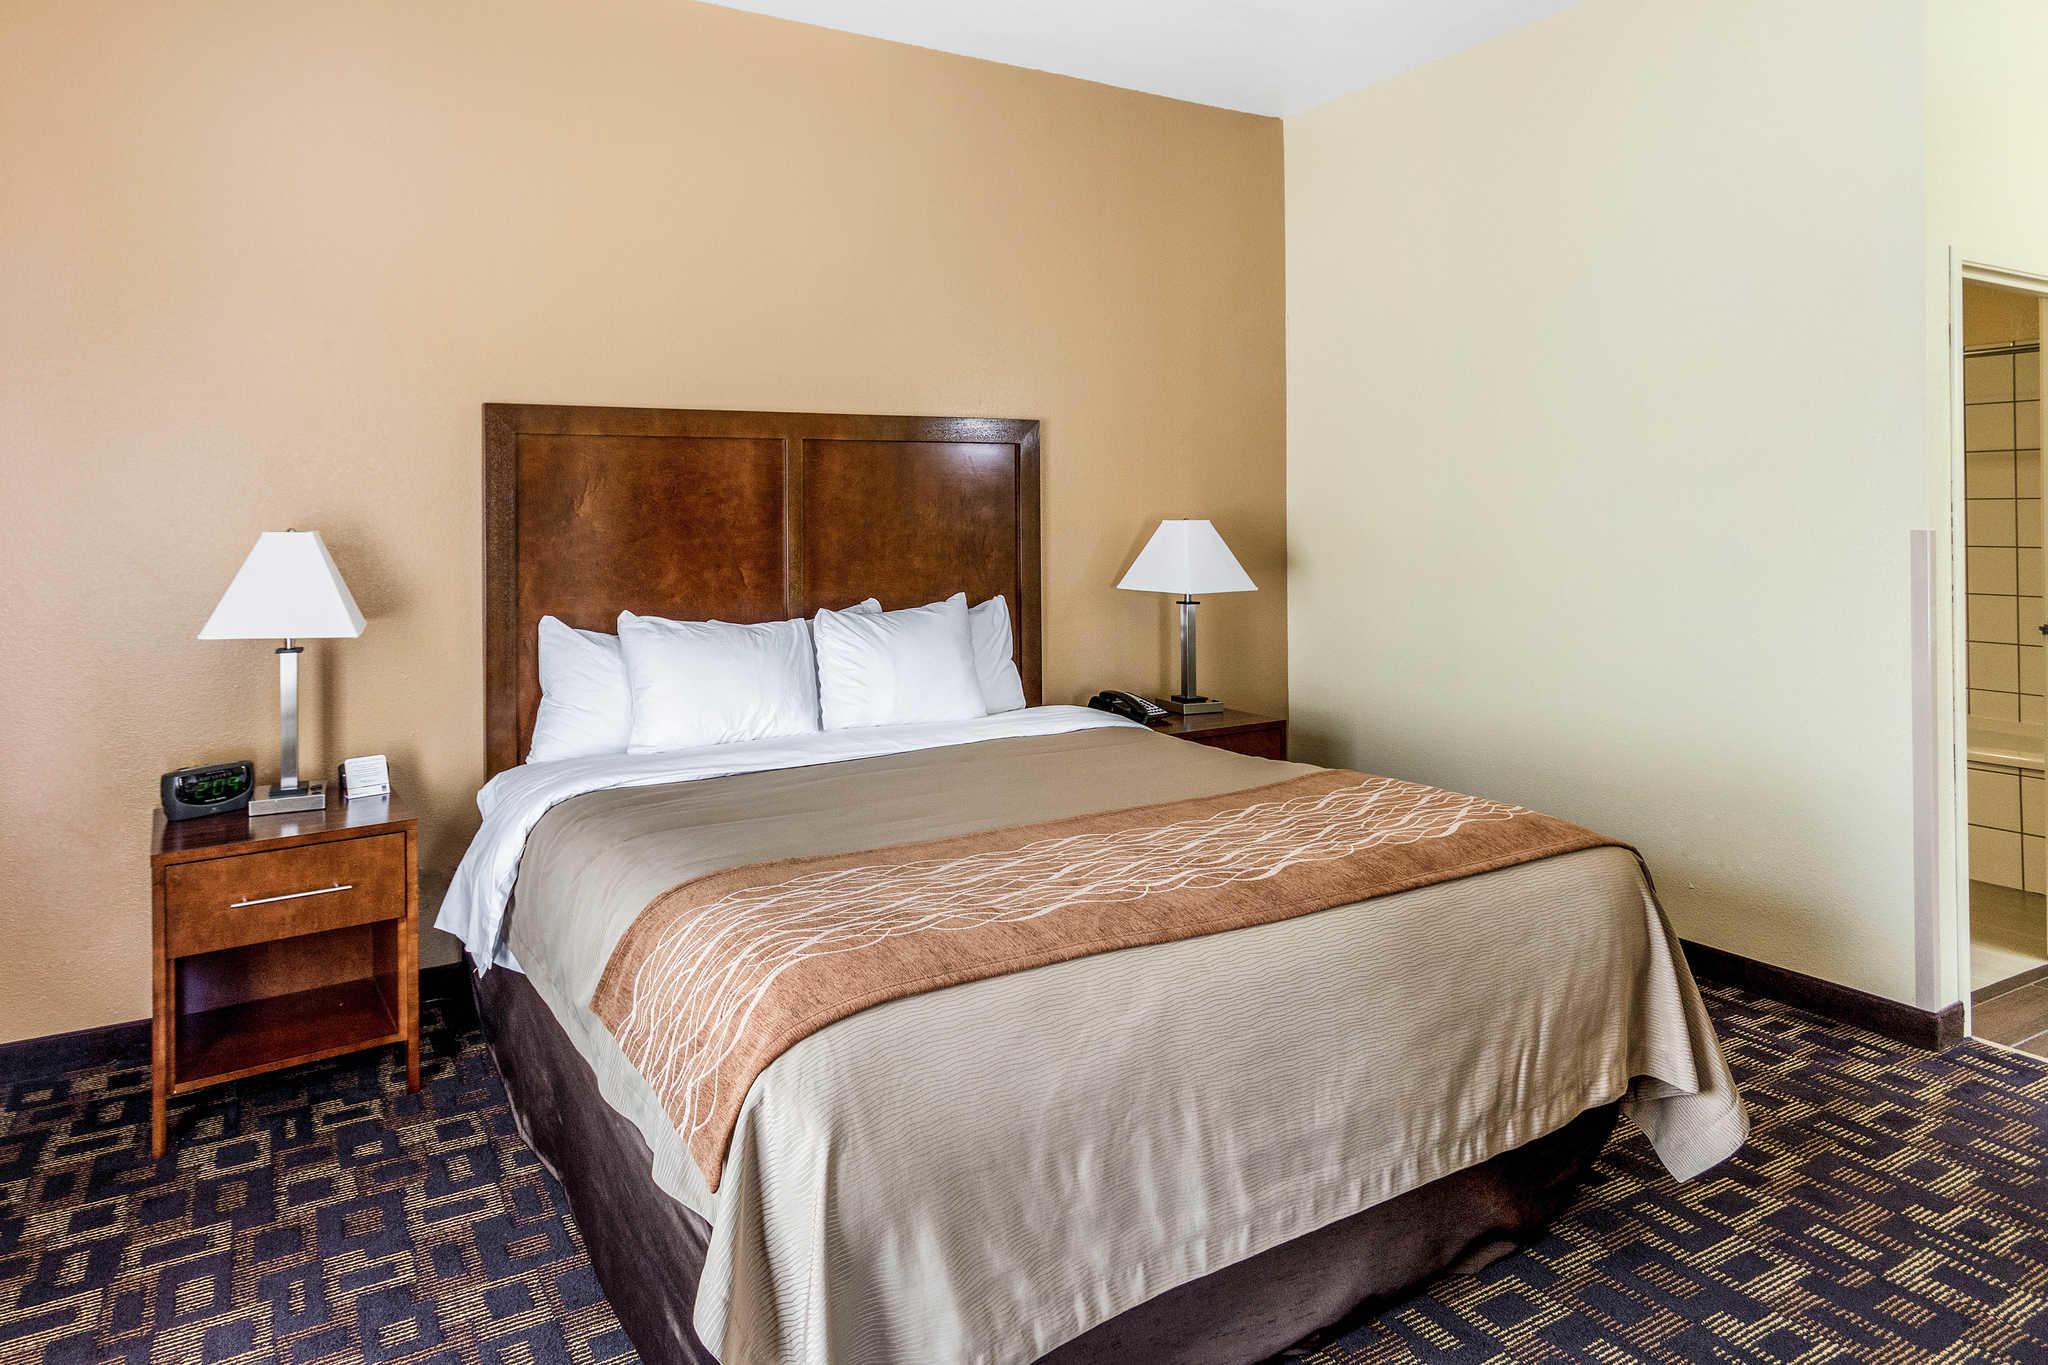 Comfort Inn & Suites North Aurora - Naperville image 28